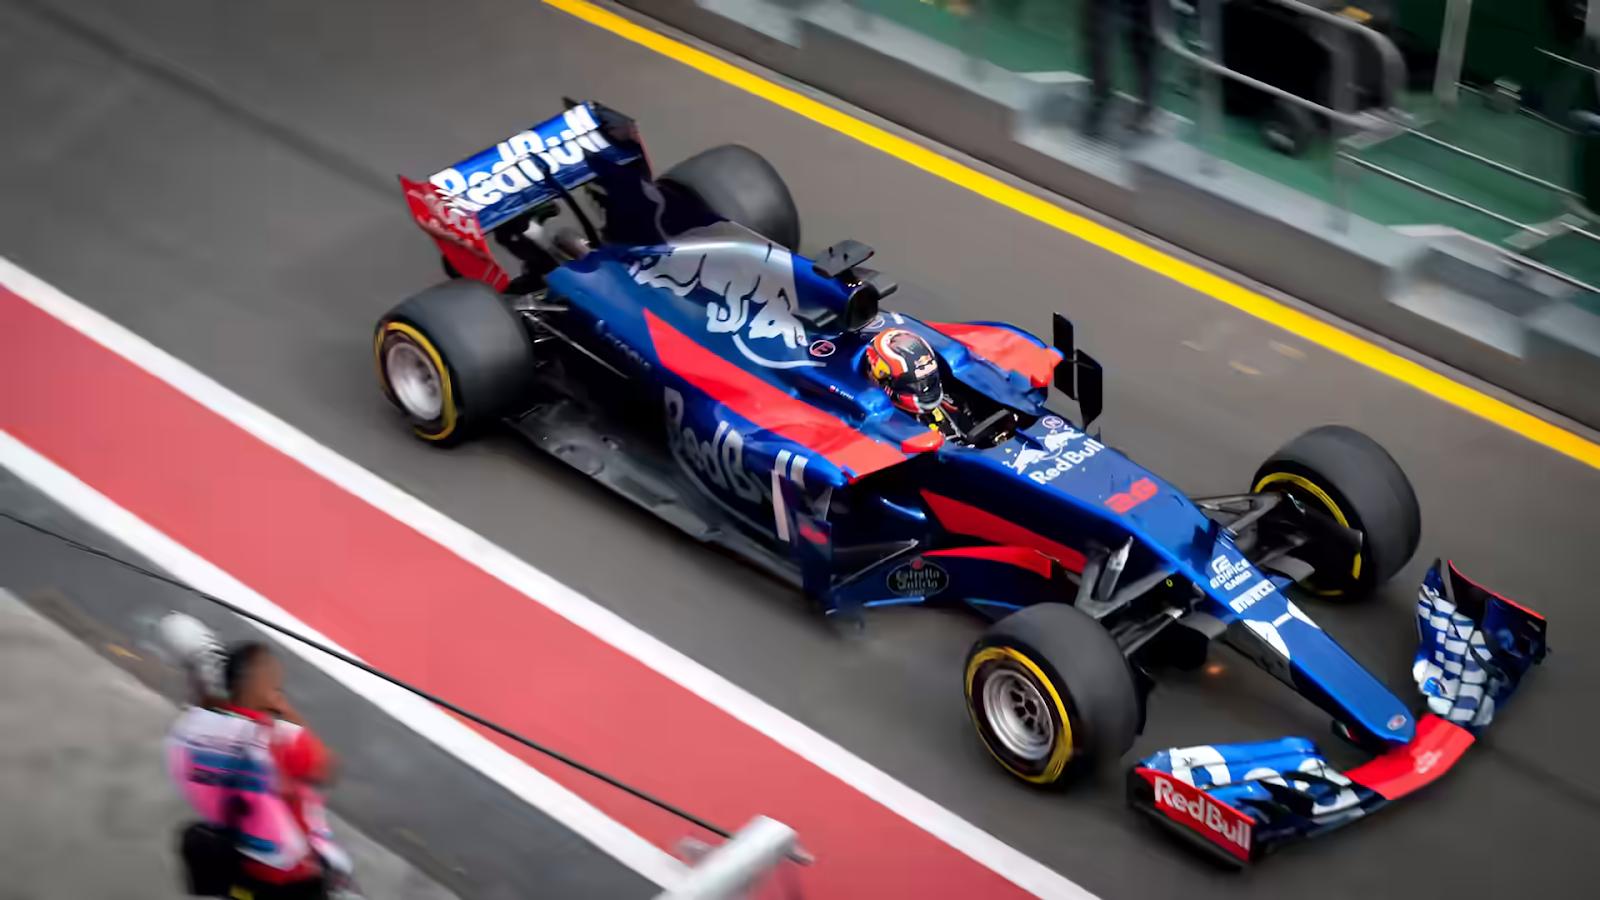 race car photo in AVIF (18.2kB)